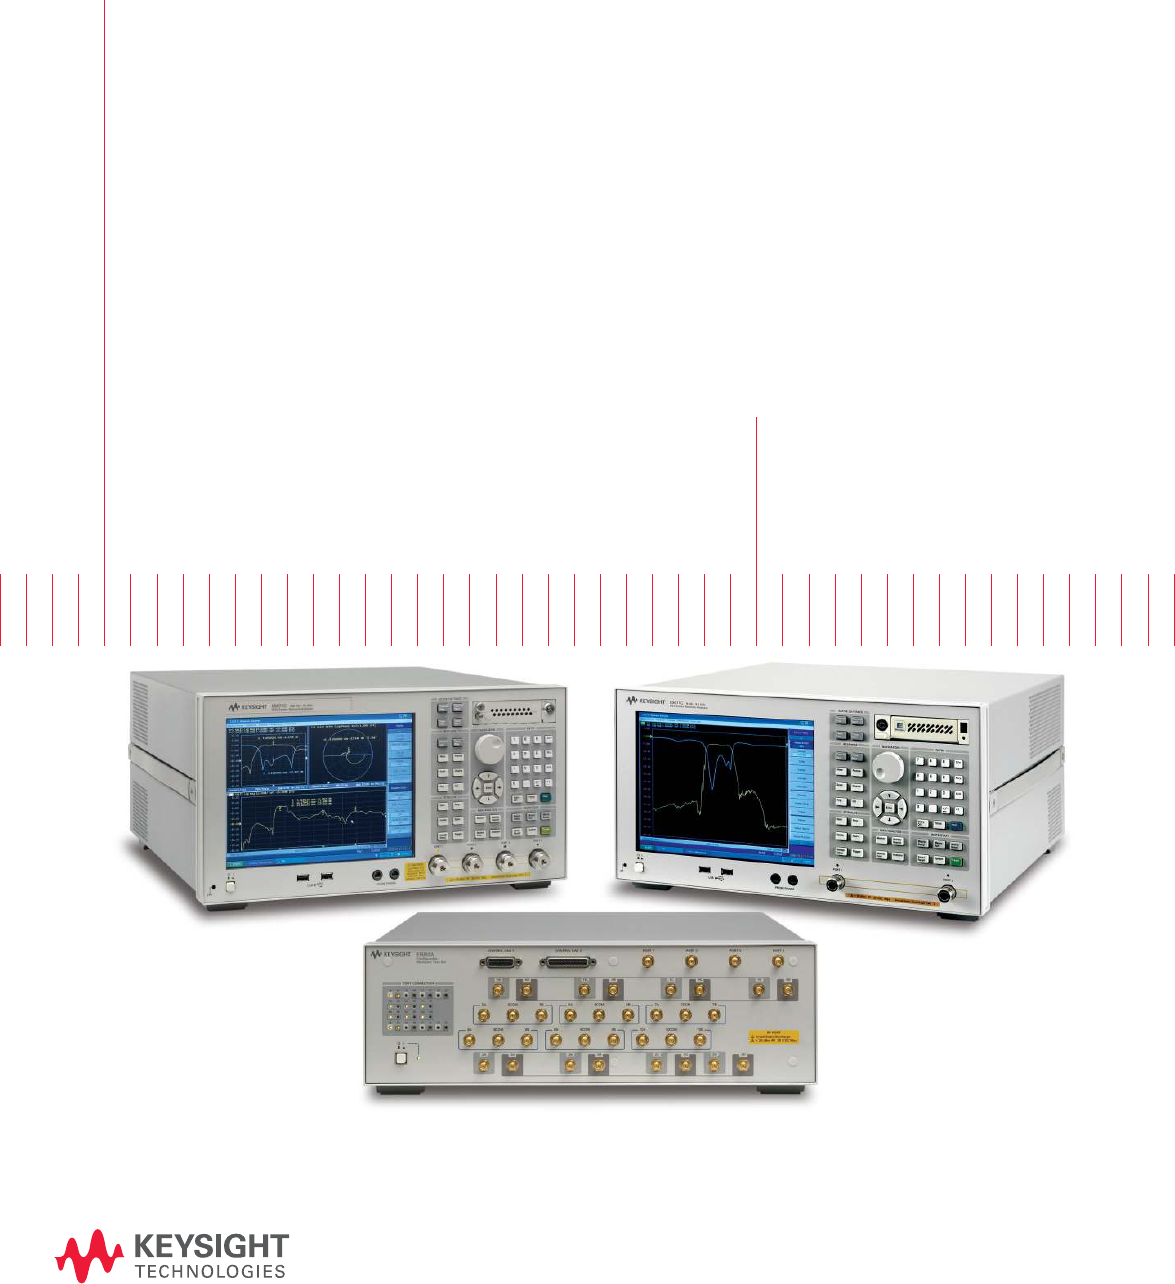 Technical support: e5071c ena vector network analyzer | keysight.